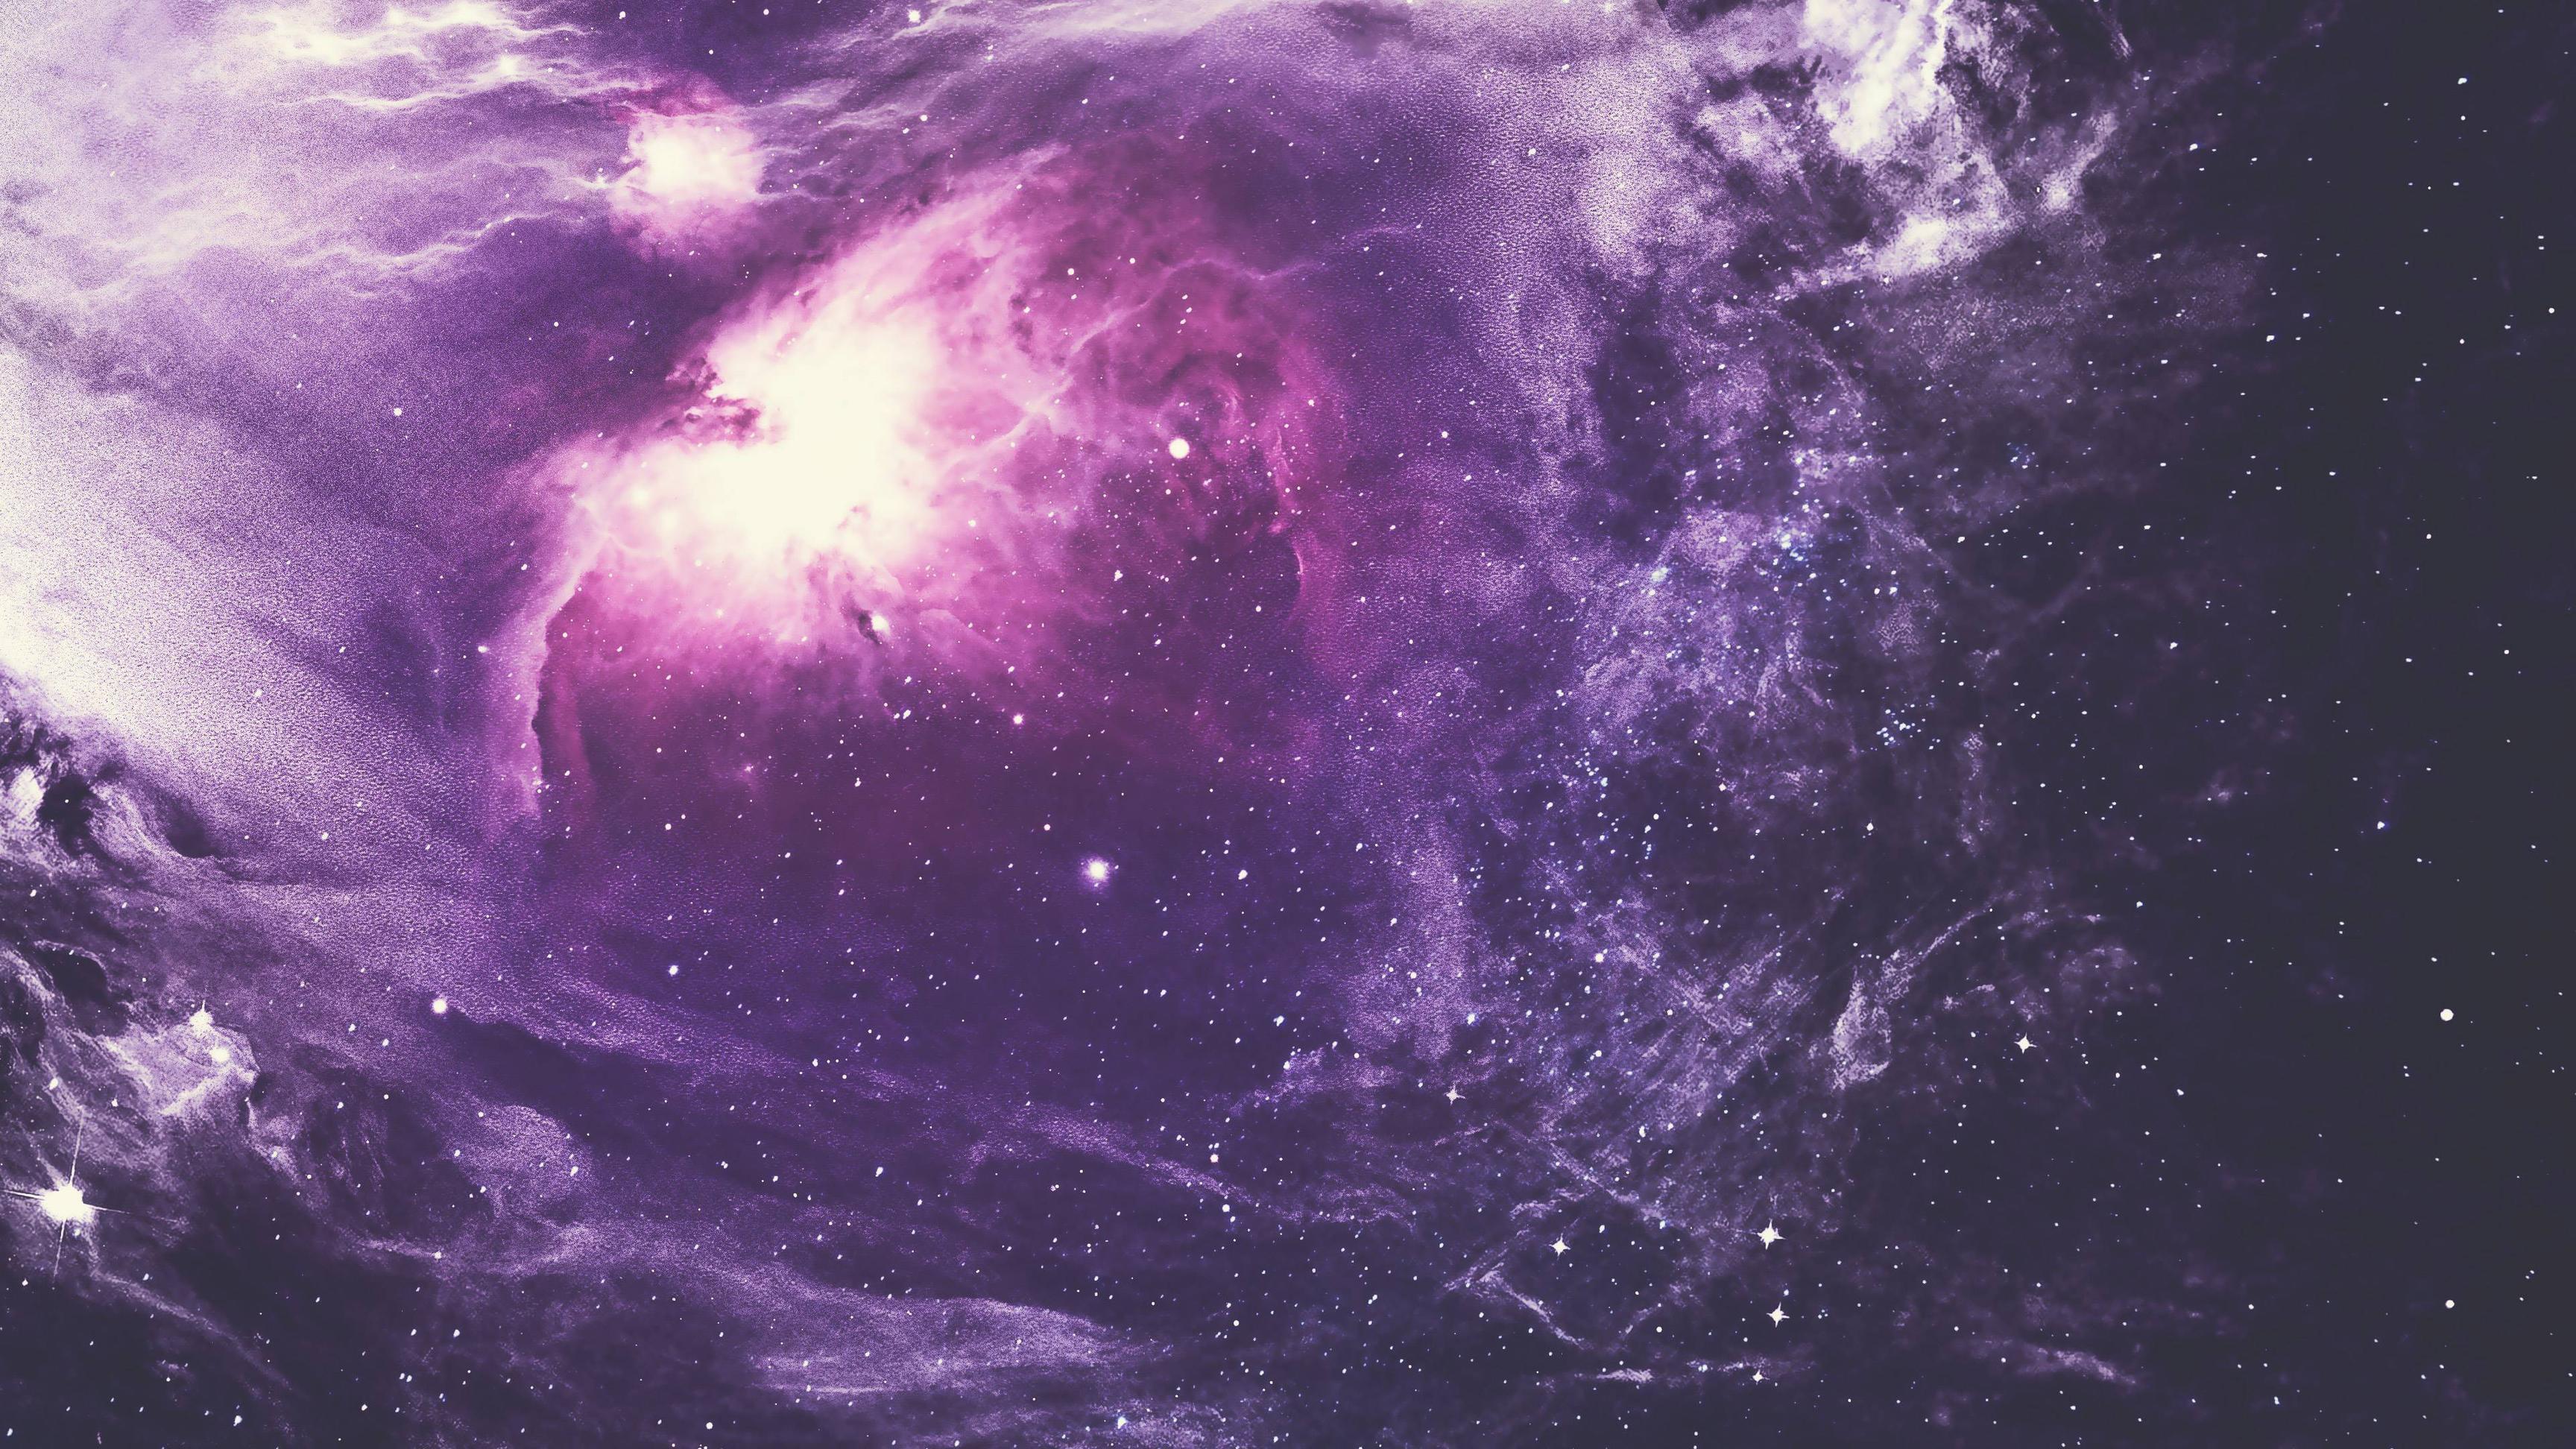 Purple Nebula 4k | Digital Universe HD 4k Wallpapers